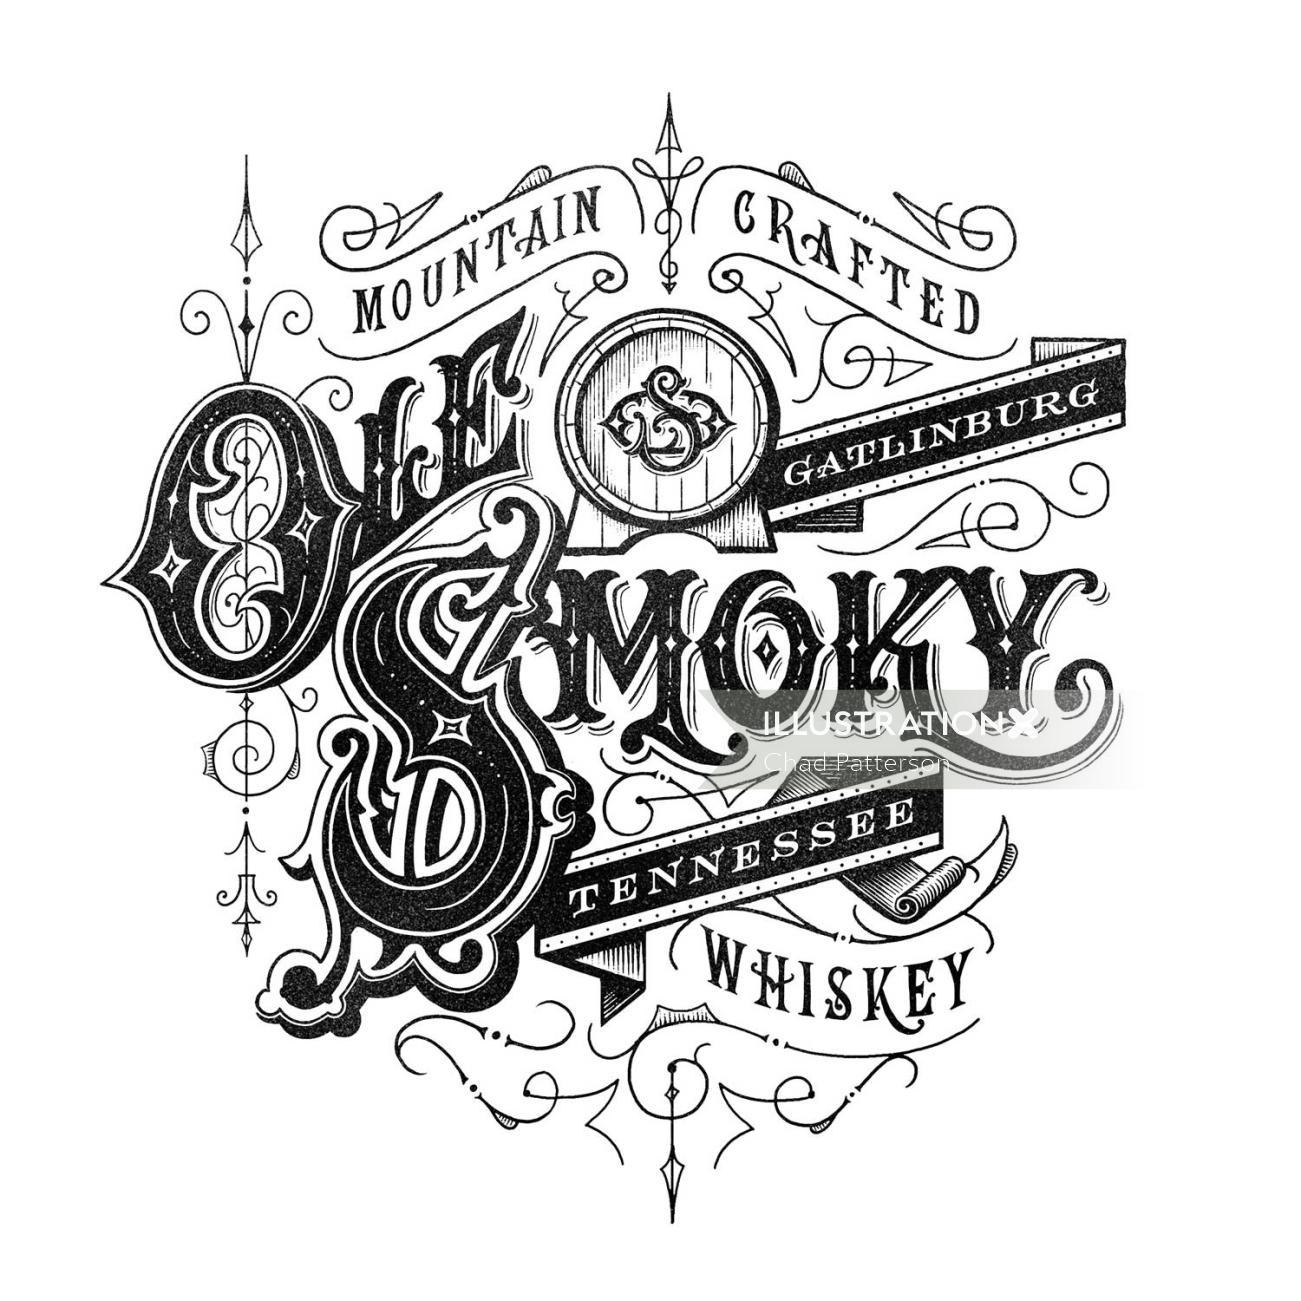 Logo Design for Ole' Smokey Moonshine